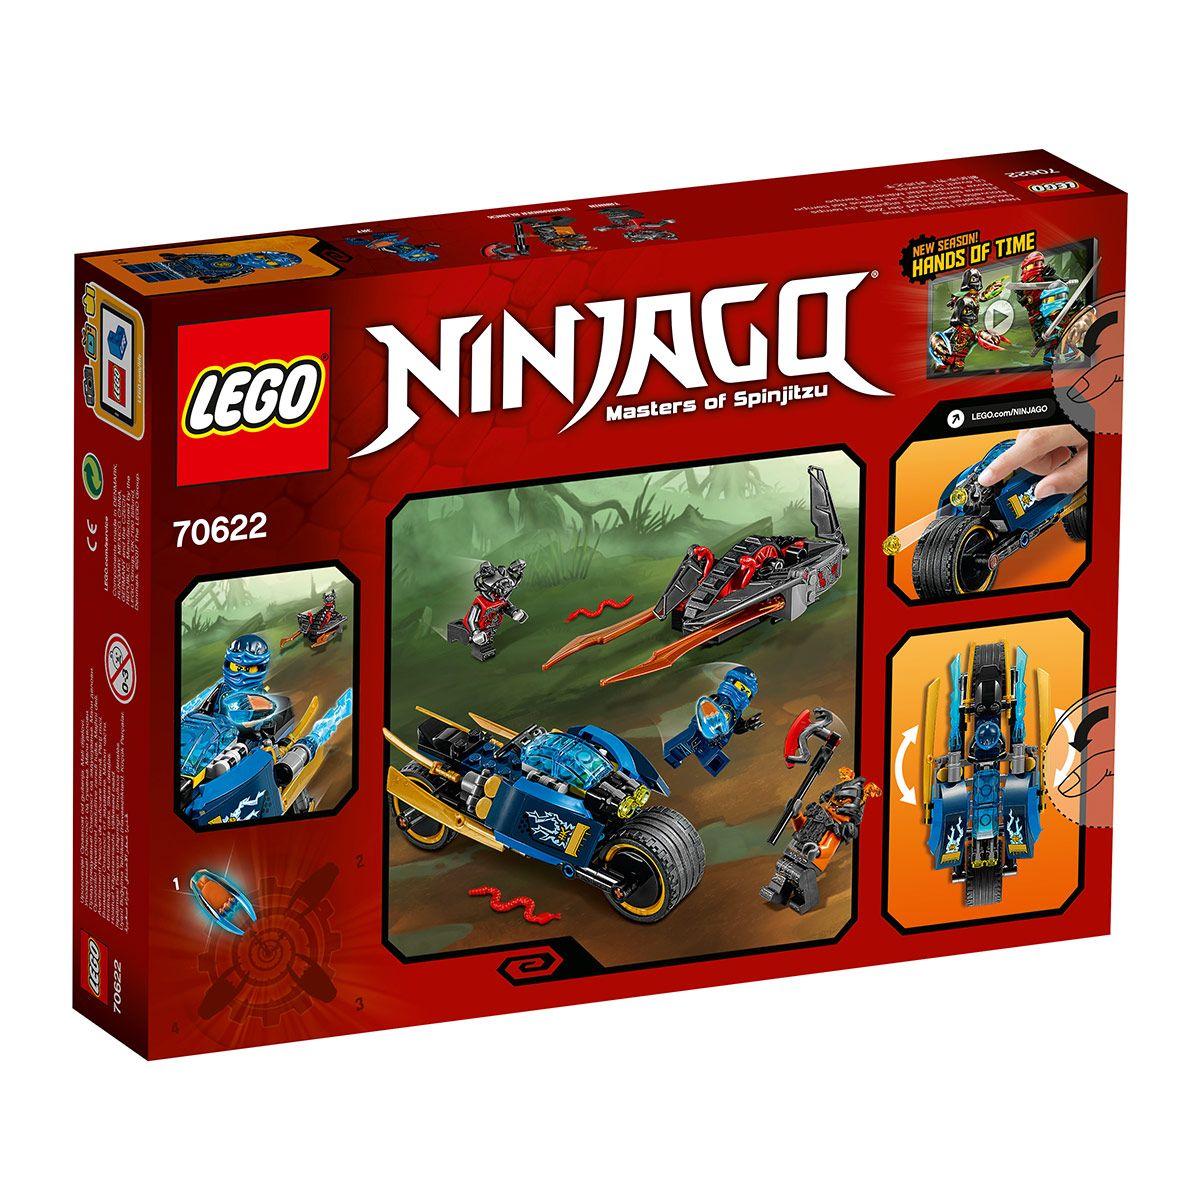 Désert Lego® Et PiratesChevaliers L'éclair Ninjago® 70622 Du Ibyfg6Yv7